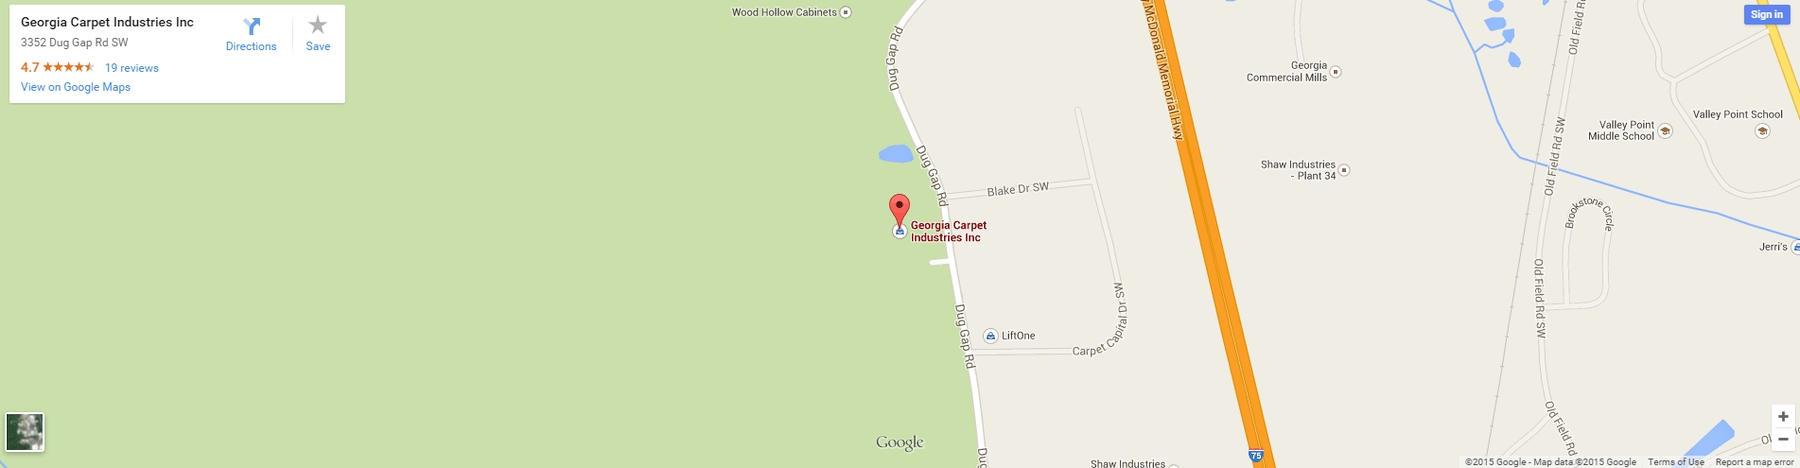 Georgia Carpet Industries on Google Maps